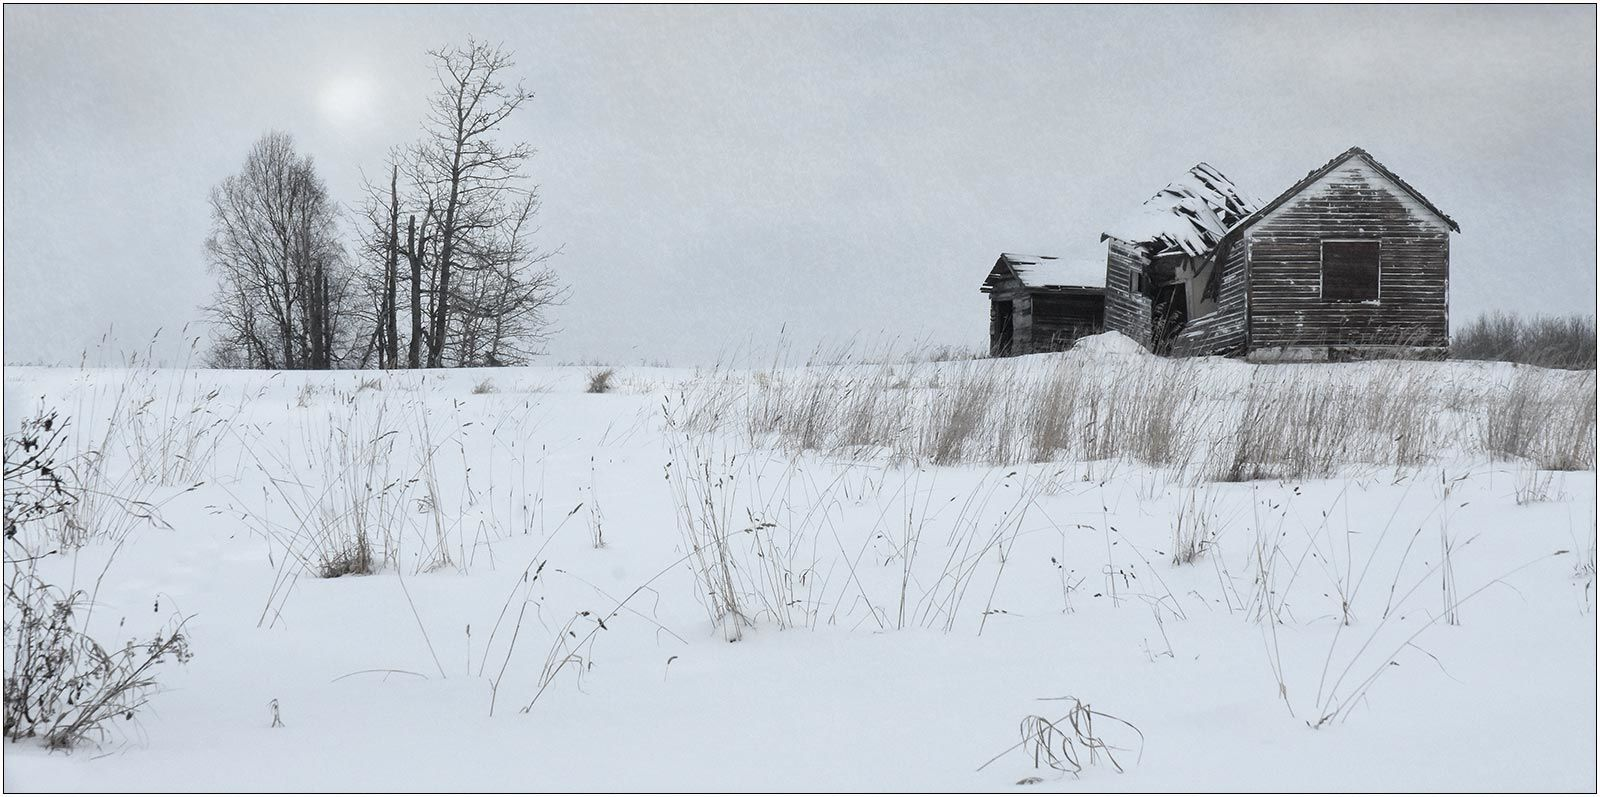 Winter, Homestead